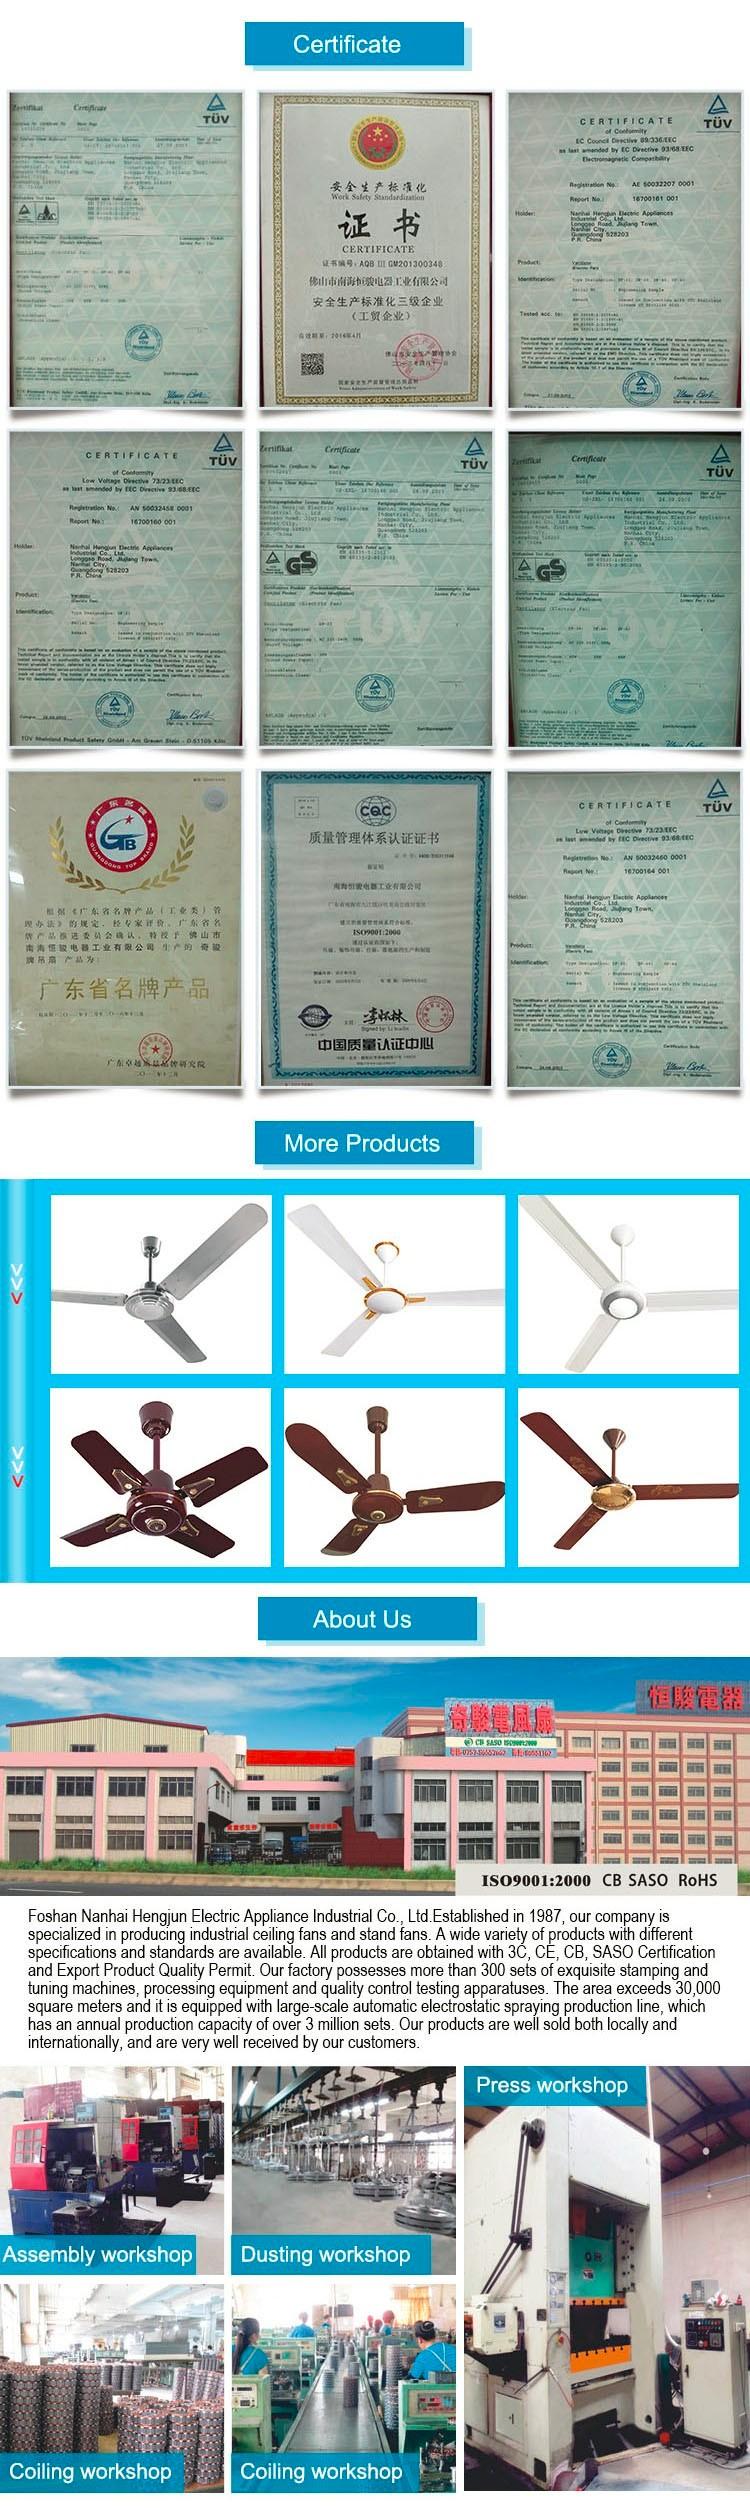 lg imagery kic kichler fan wanted ashbyrn fans natural ceiling brass best brands